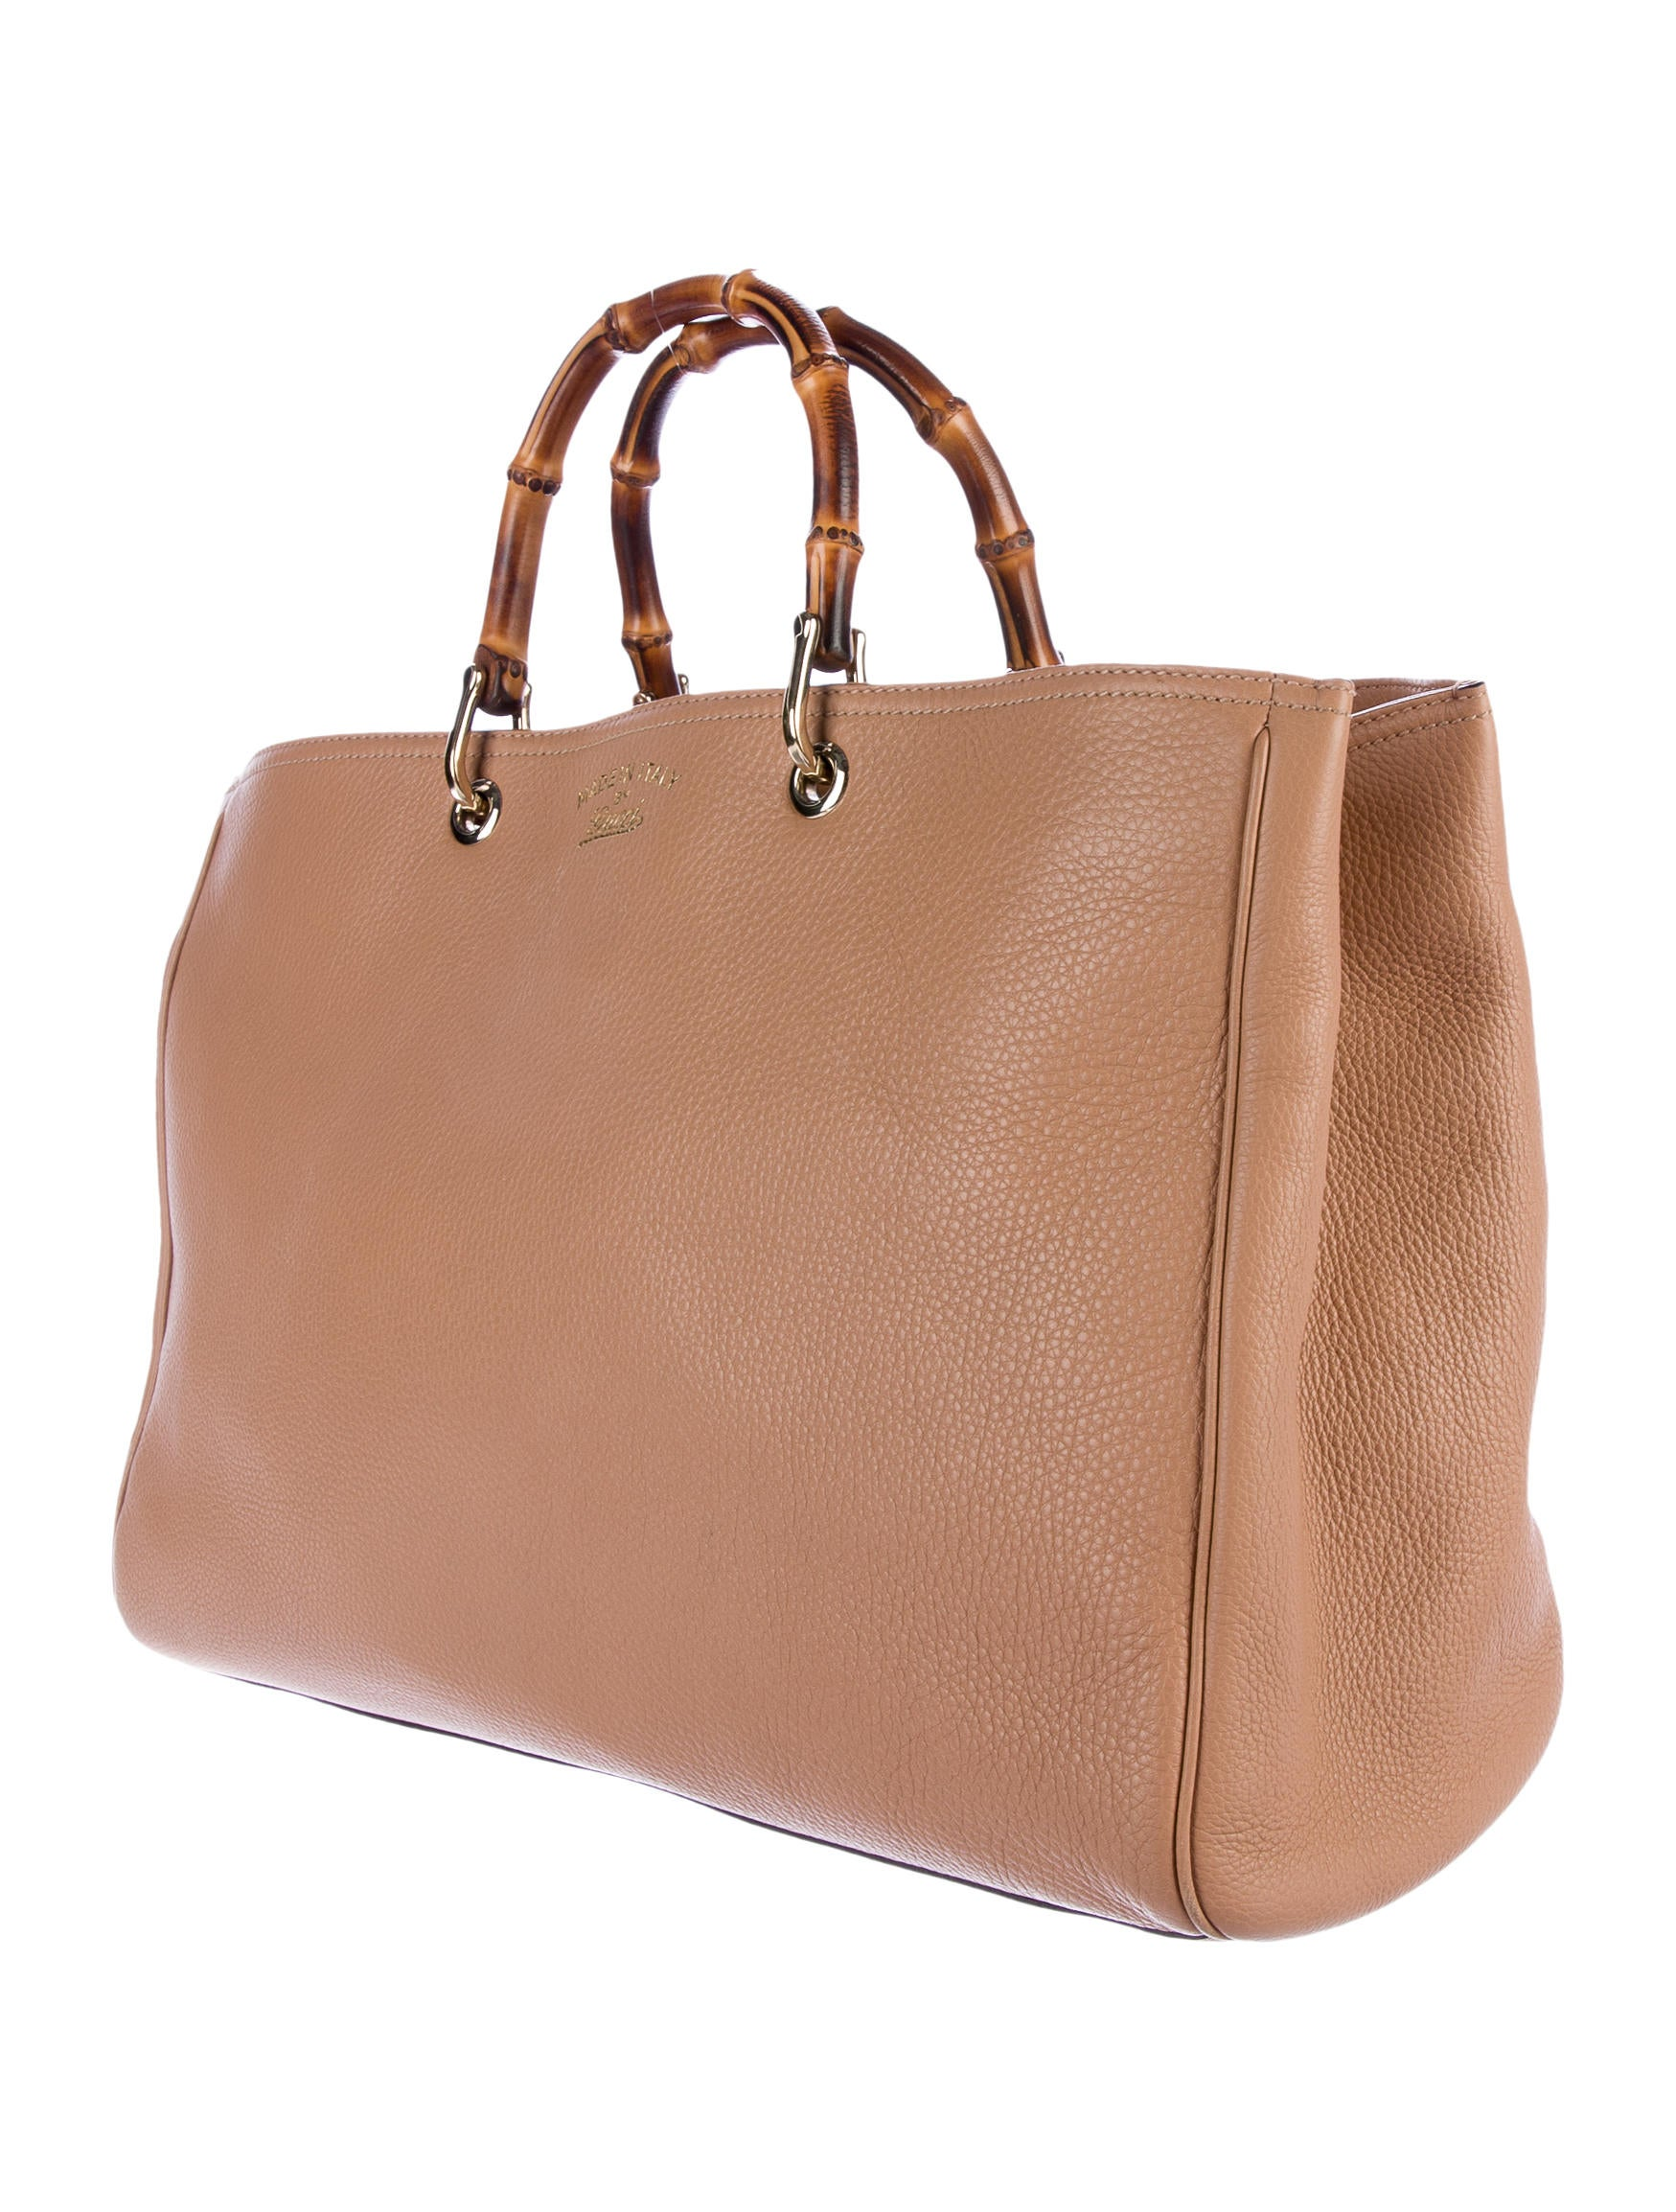 gucci large bamboo shopper handbags guc151230 the realreal. Black Bedroom Furniture Sets. Home Design Ideas